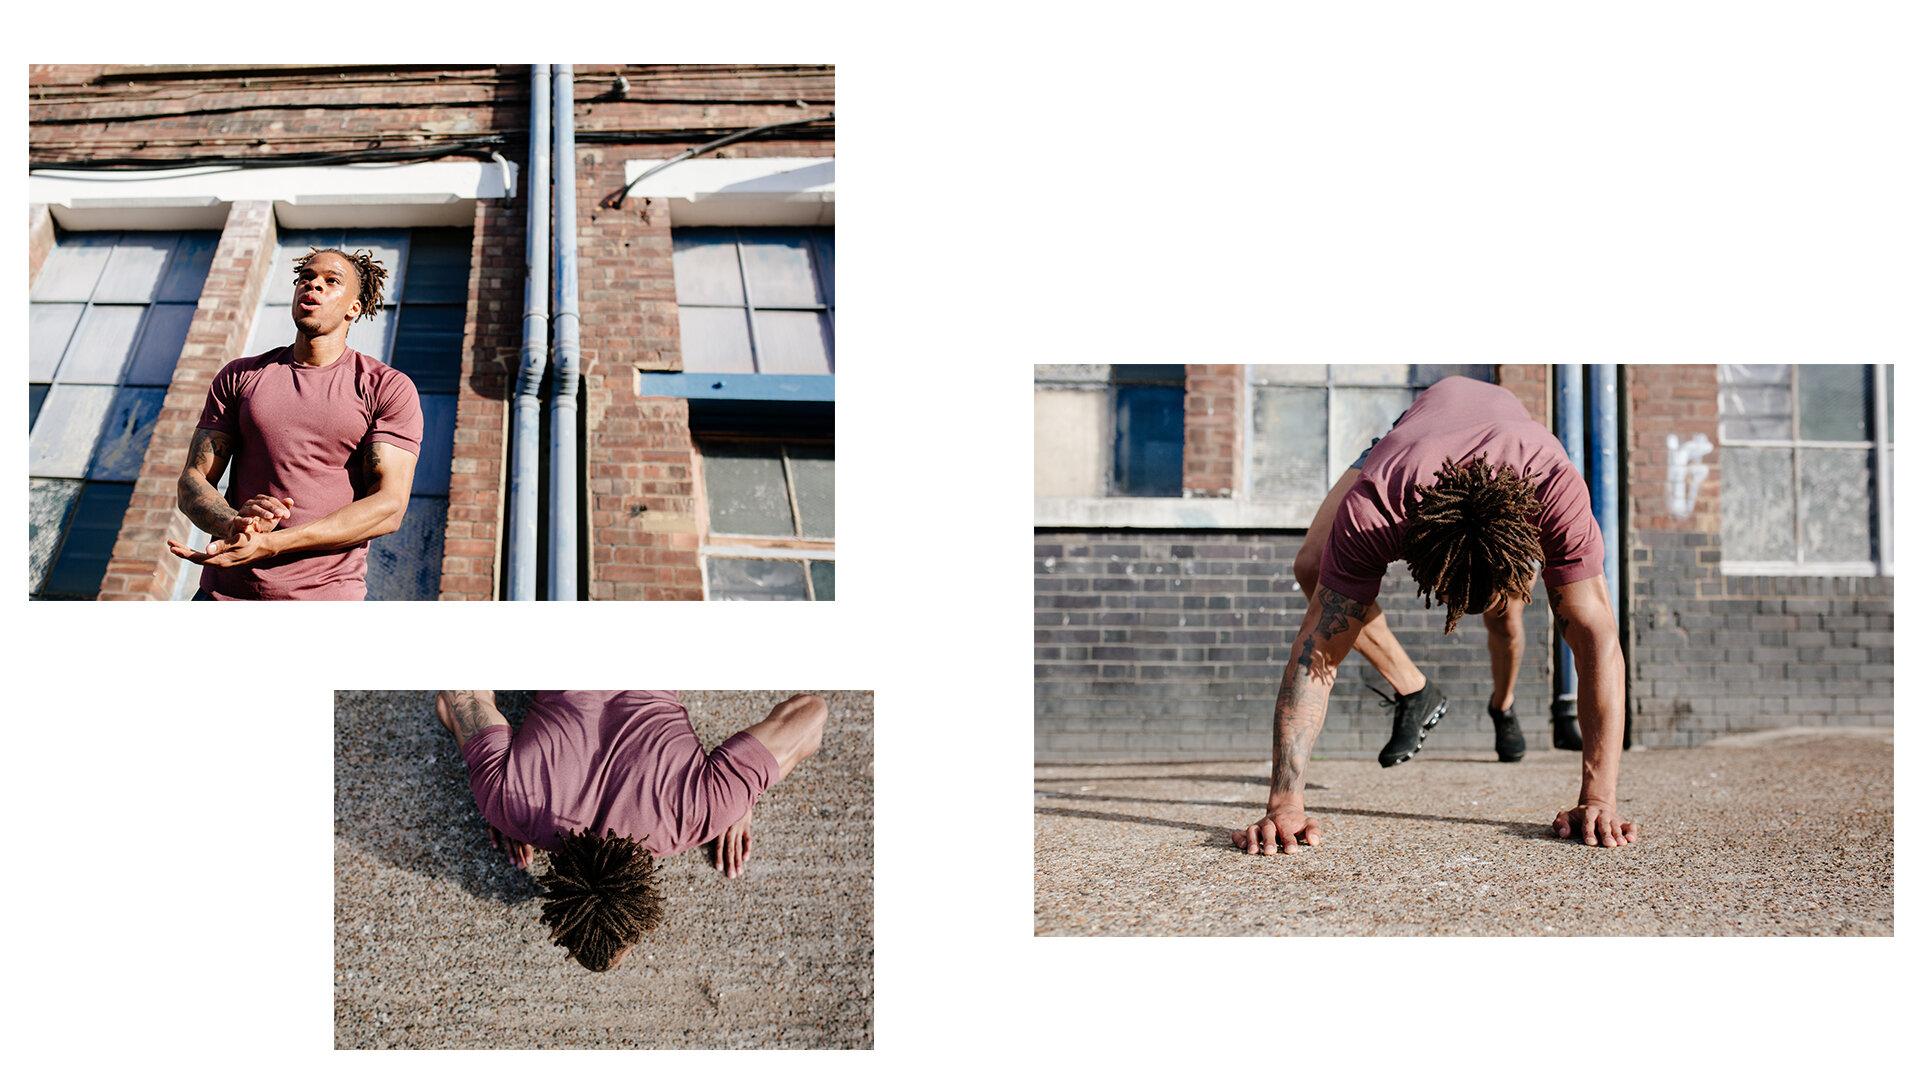 toby-butler-tobybutlerphoto-photography-fitness-lifestyle-lifestylephotographer-london-city-body-lululemon-yoga-stretch-emotion-physical-3.jpg